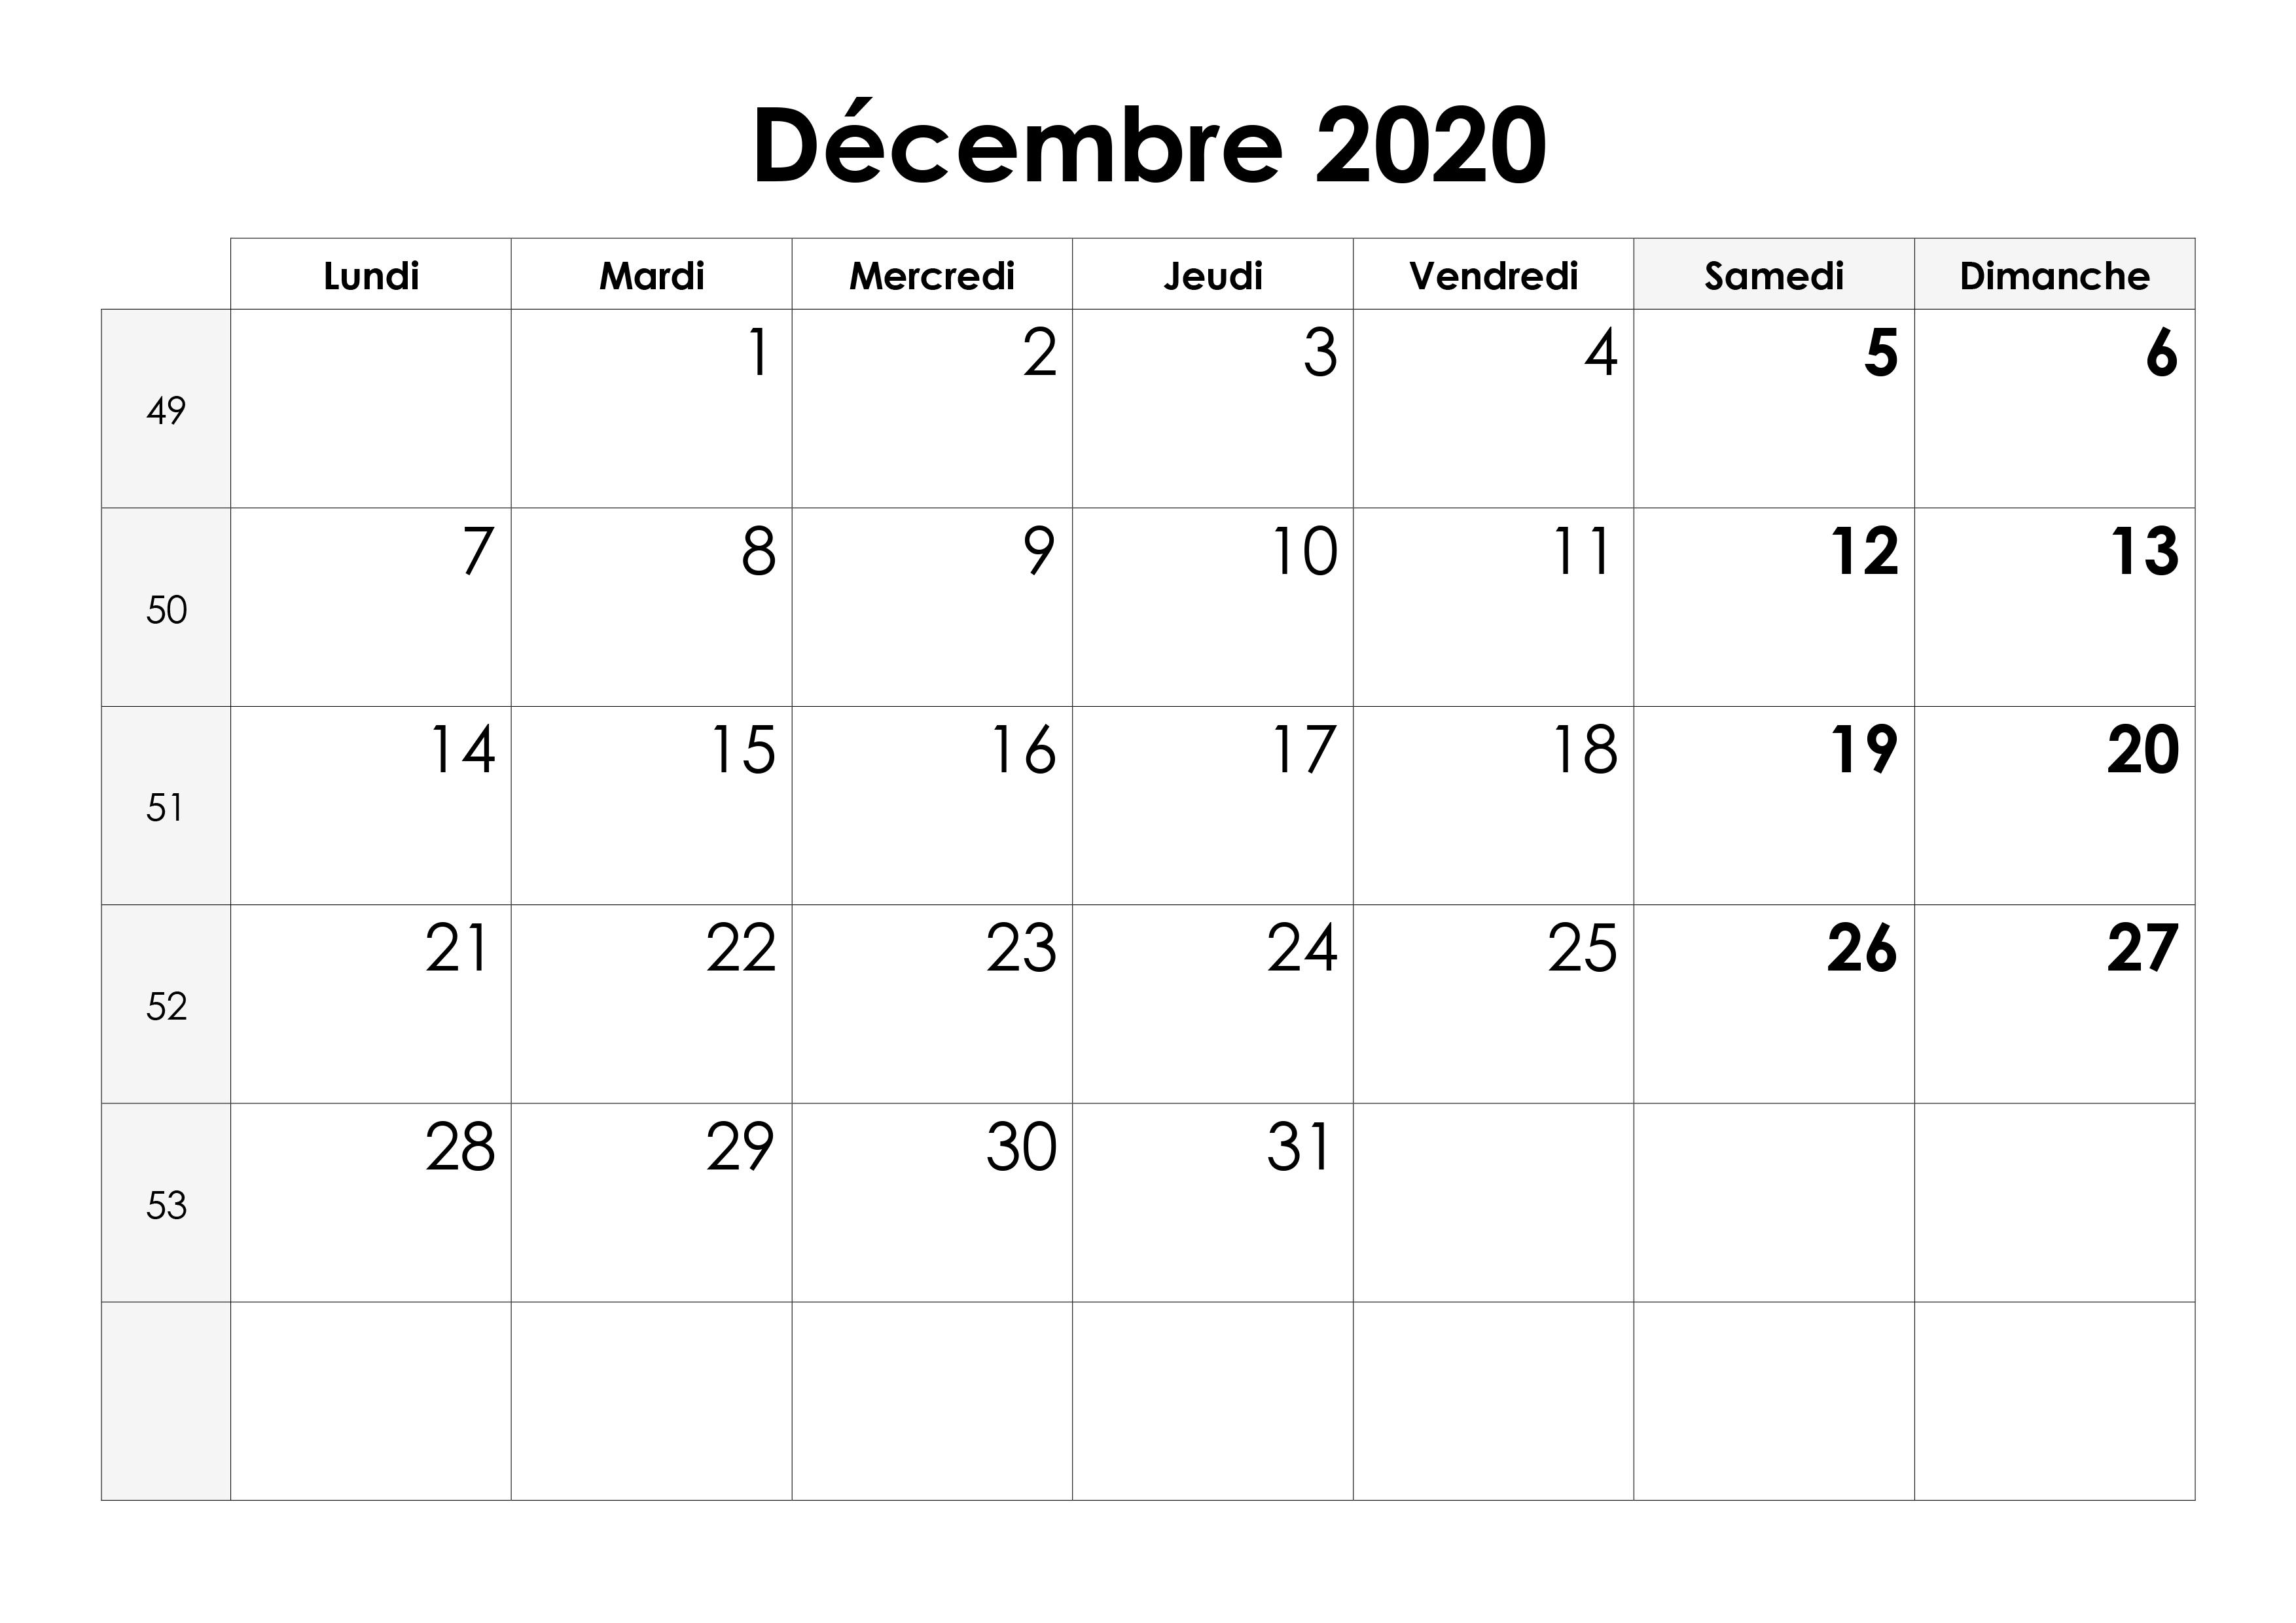 Calendrier Decembre 2020.Calendrier Decembre 2020 Calendrier Su